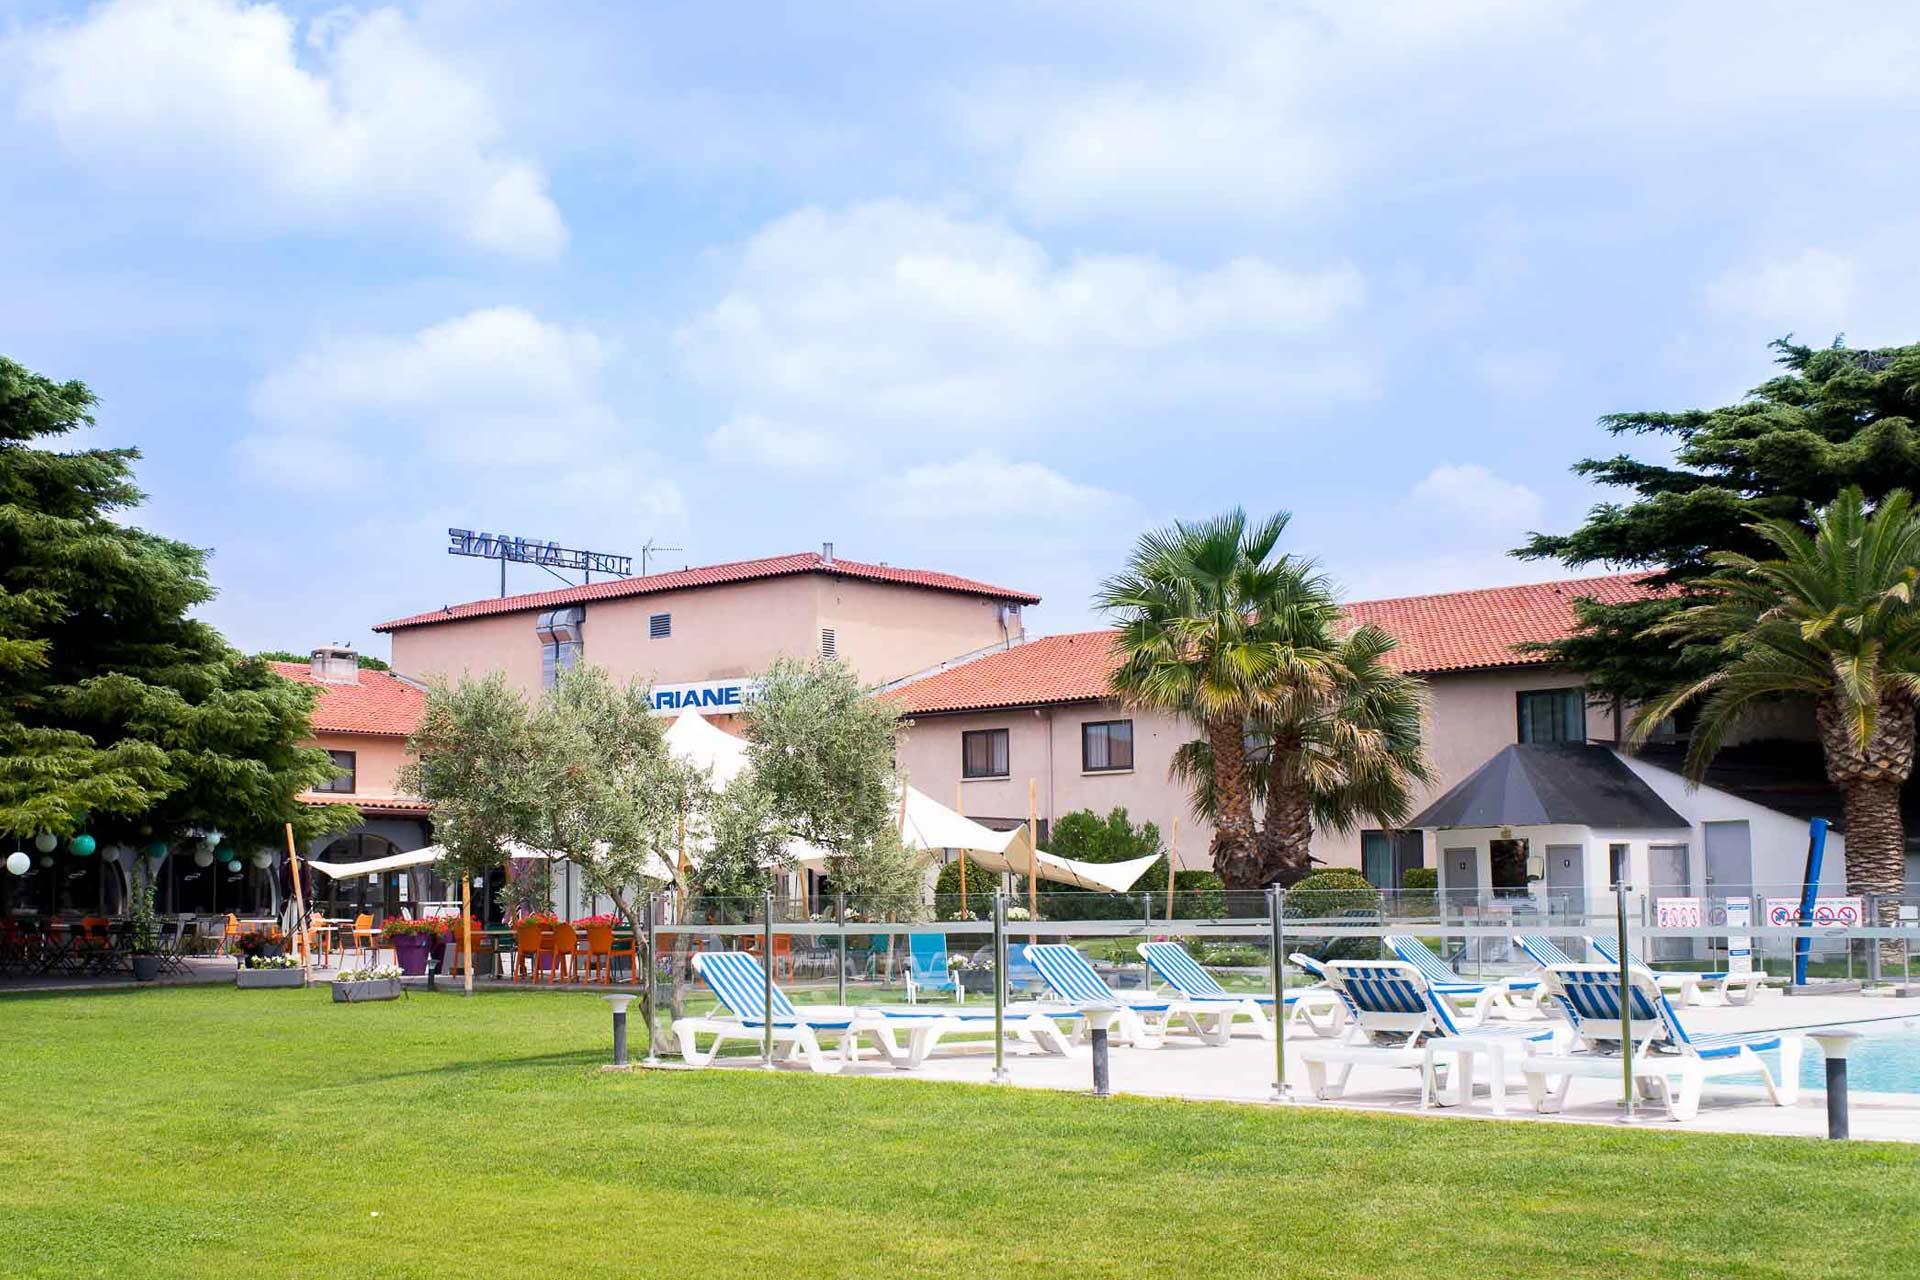 Groupe Ariane Hotel Fos sur Mer Istres